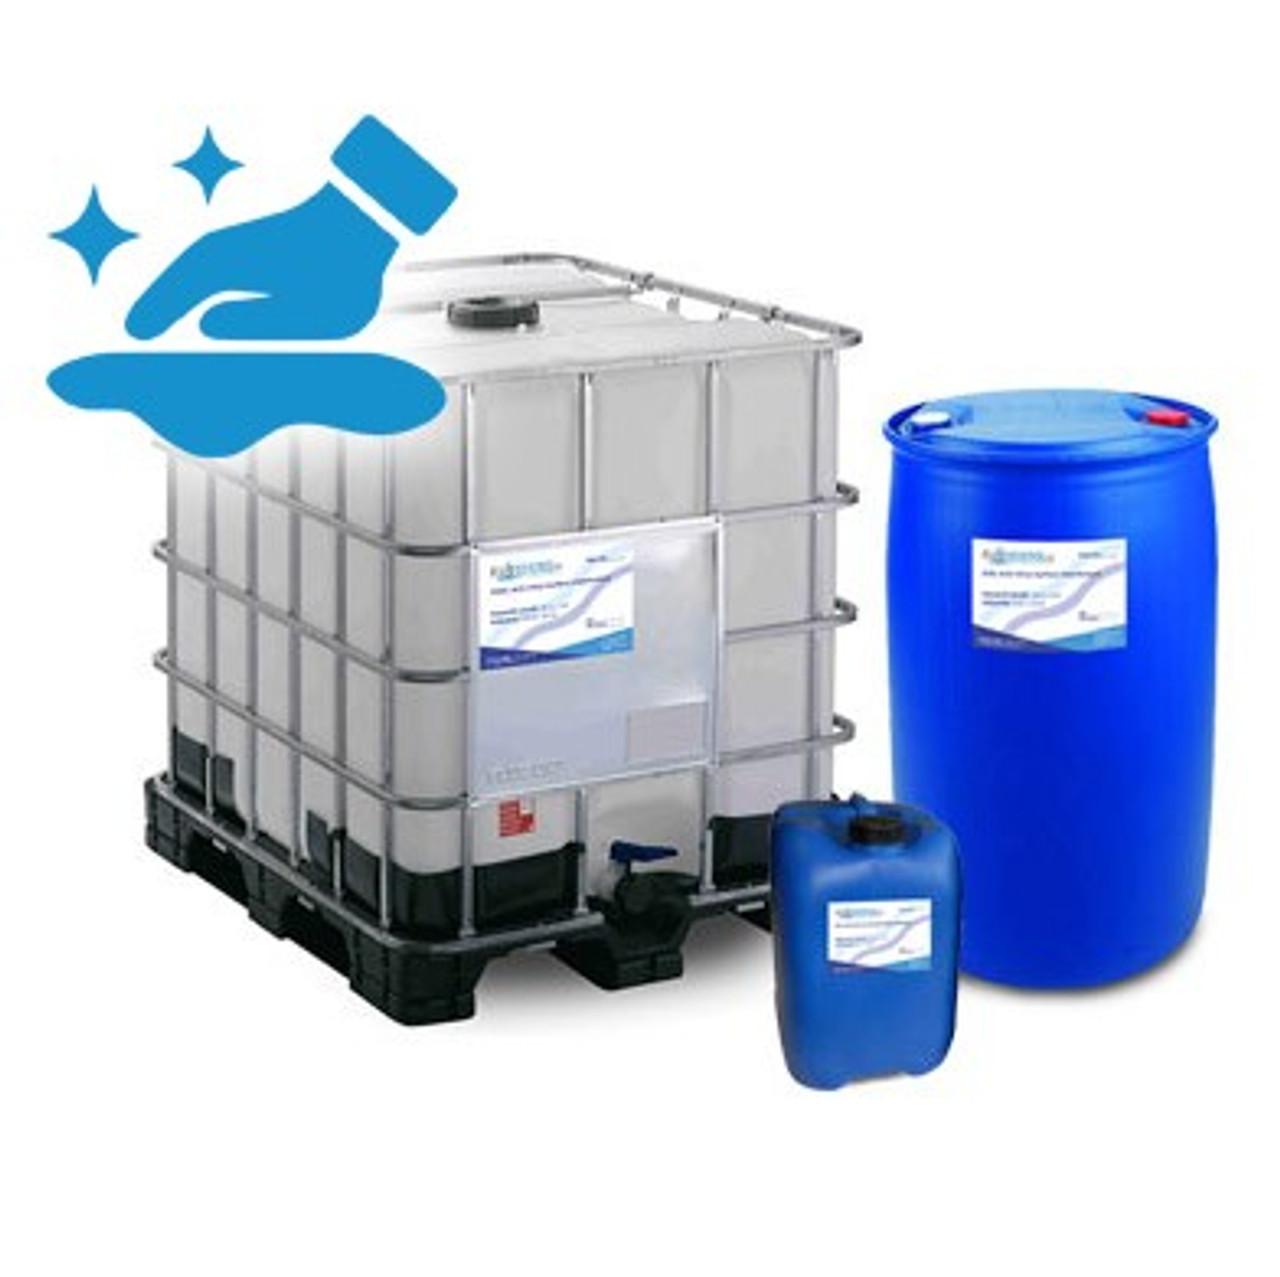 Bulk 25, 210 or 100 Litre Surface Disinfectant